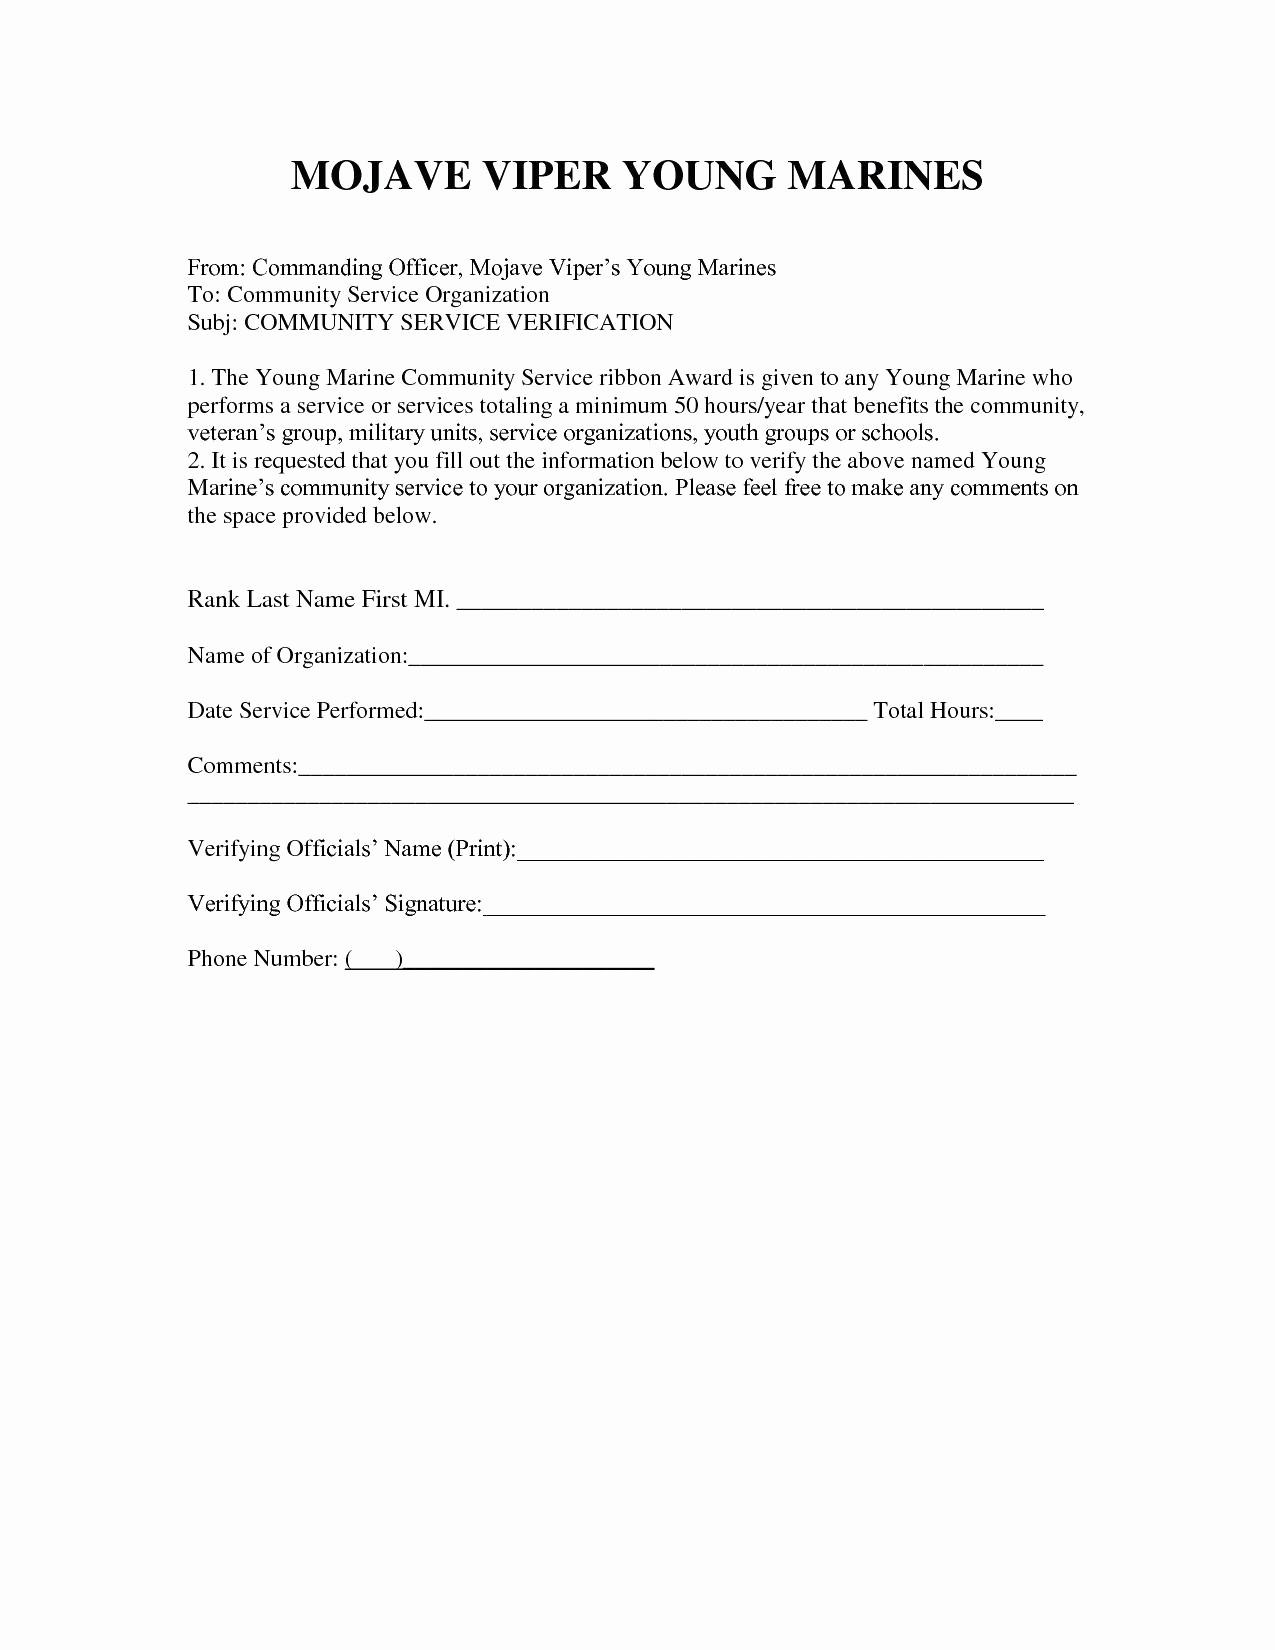 Community Service Certificate Template Free Beautiful Template Munity Service Hours Certificate Template